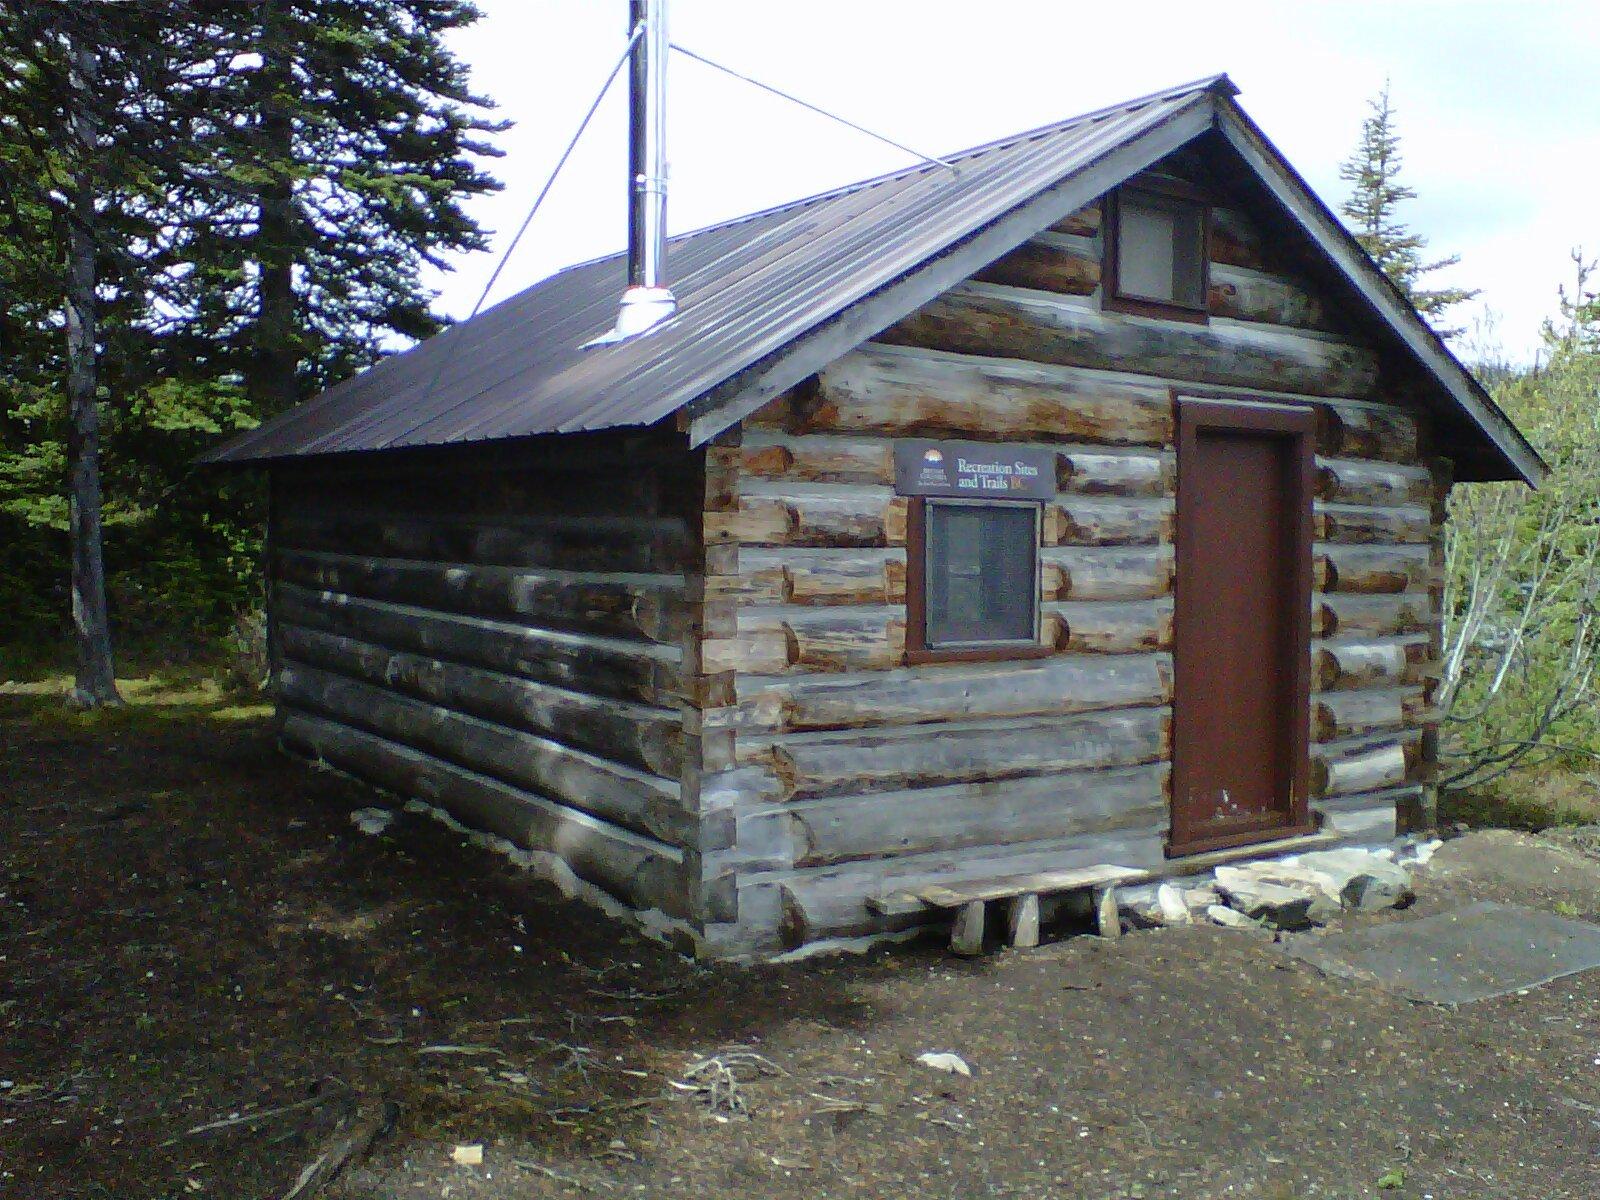 Esperon Lake Recreation Site and Free Camping on Crown Land